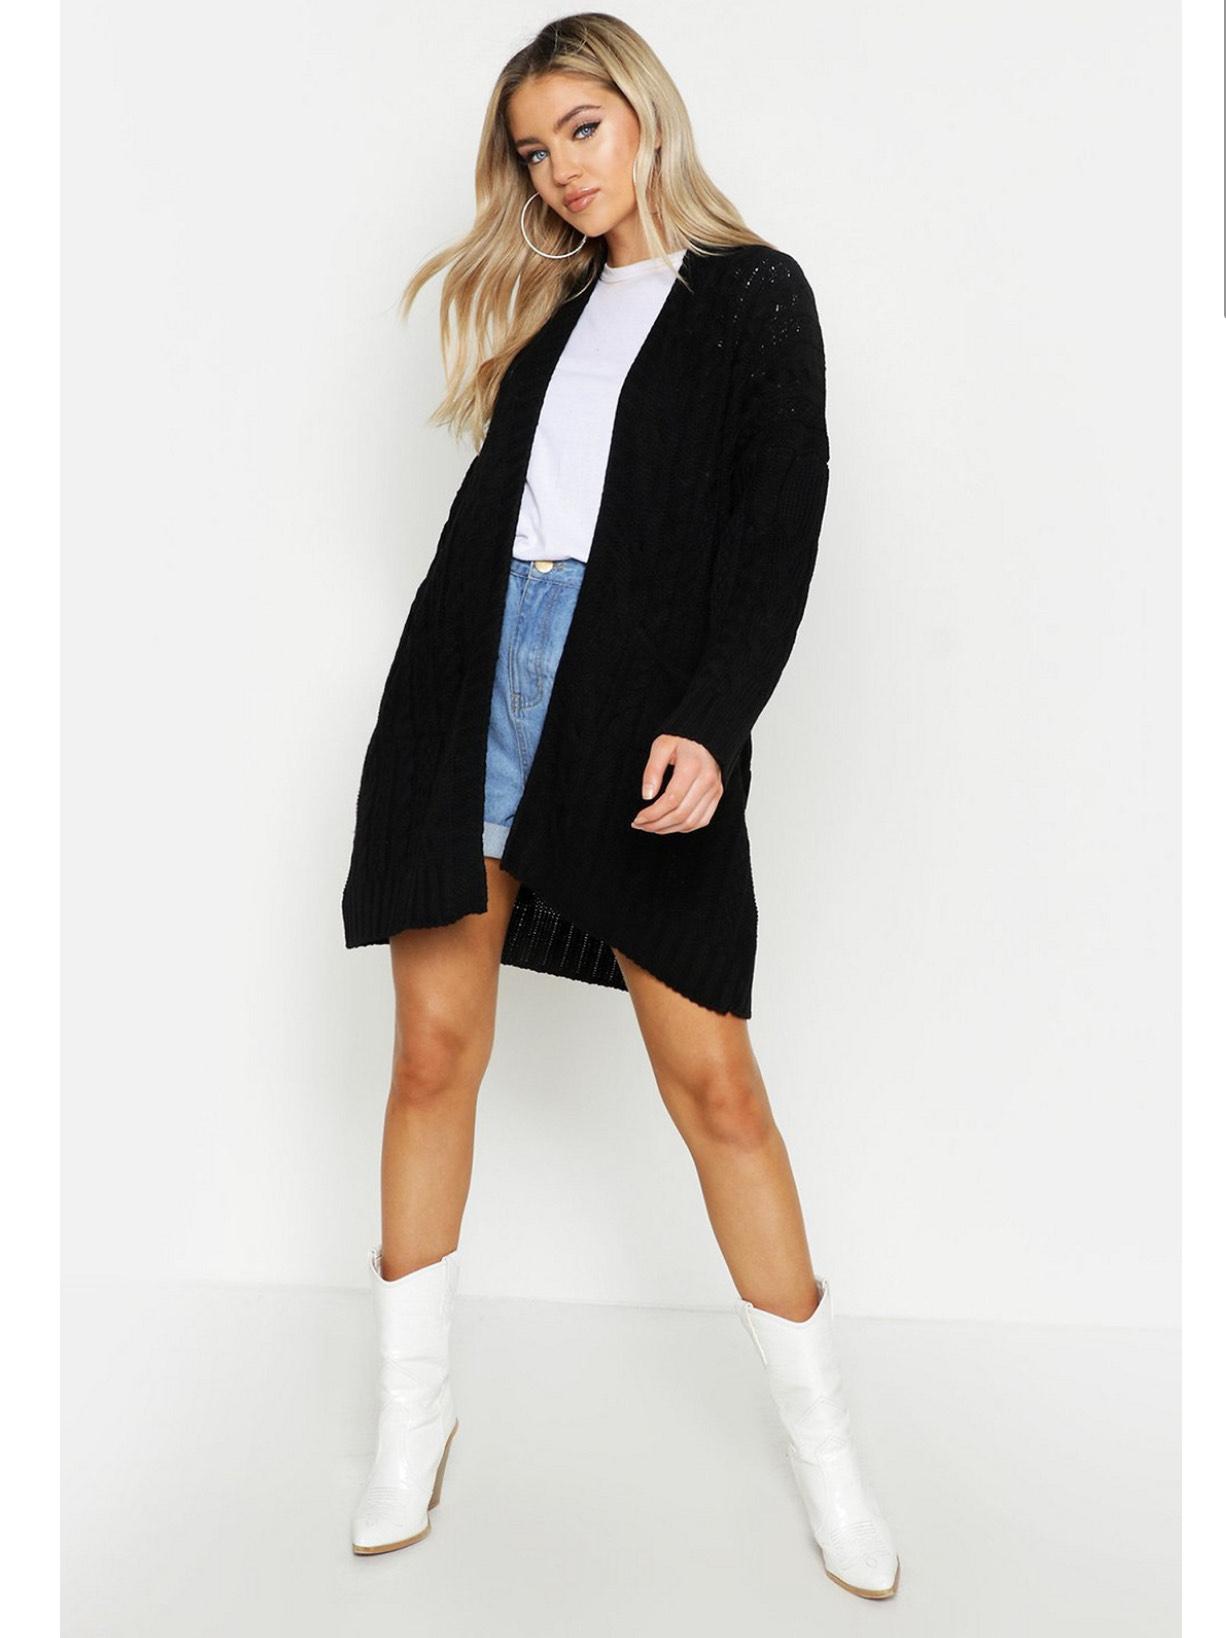 Oversized knitted cardigan - £8 (+£3.99 Shipping) @ Boohoo